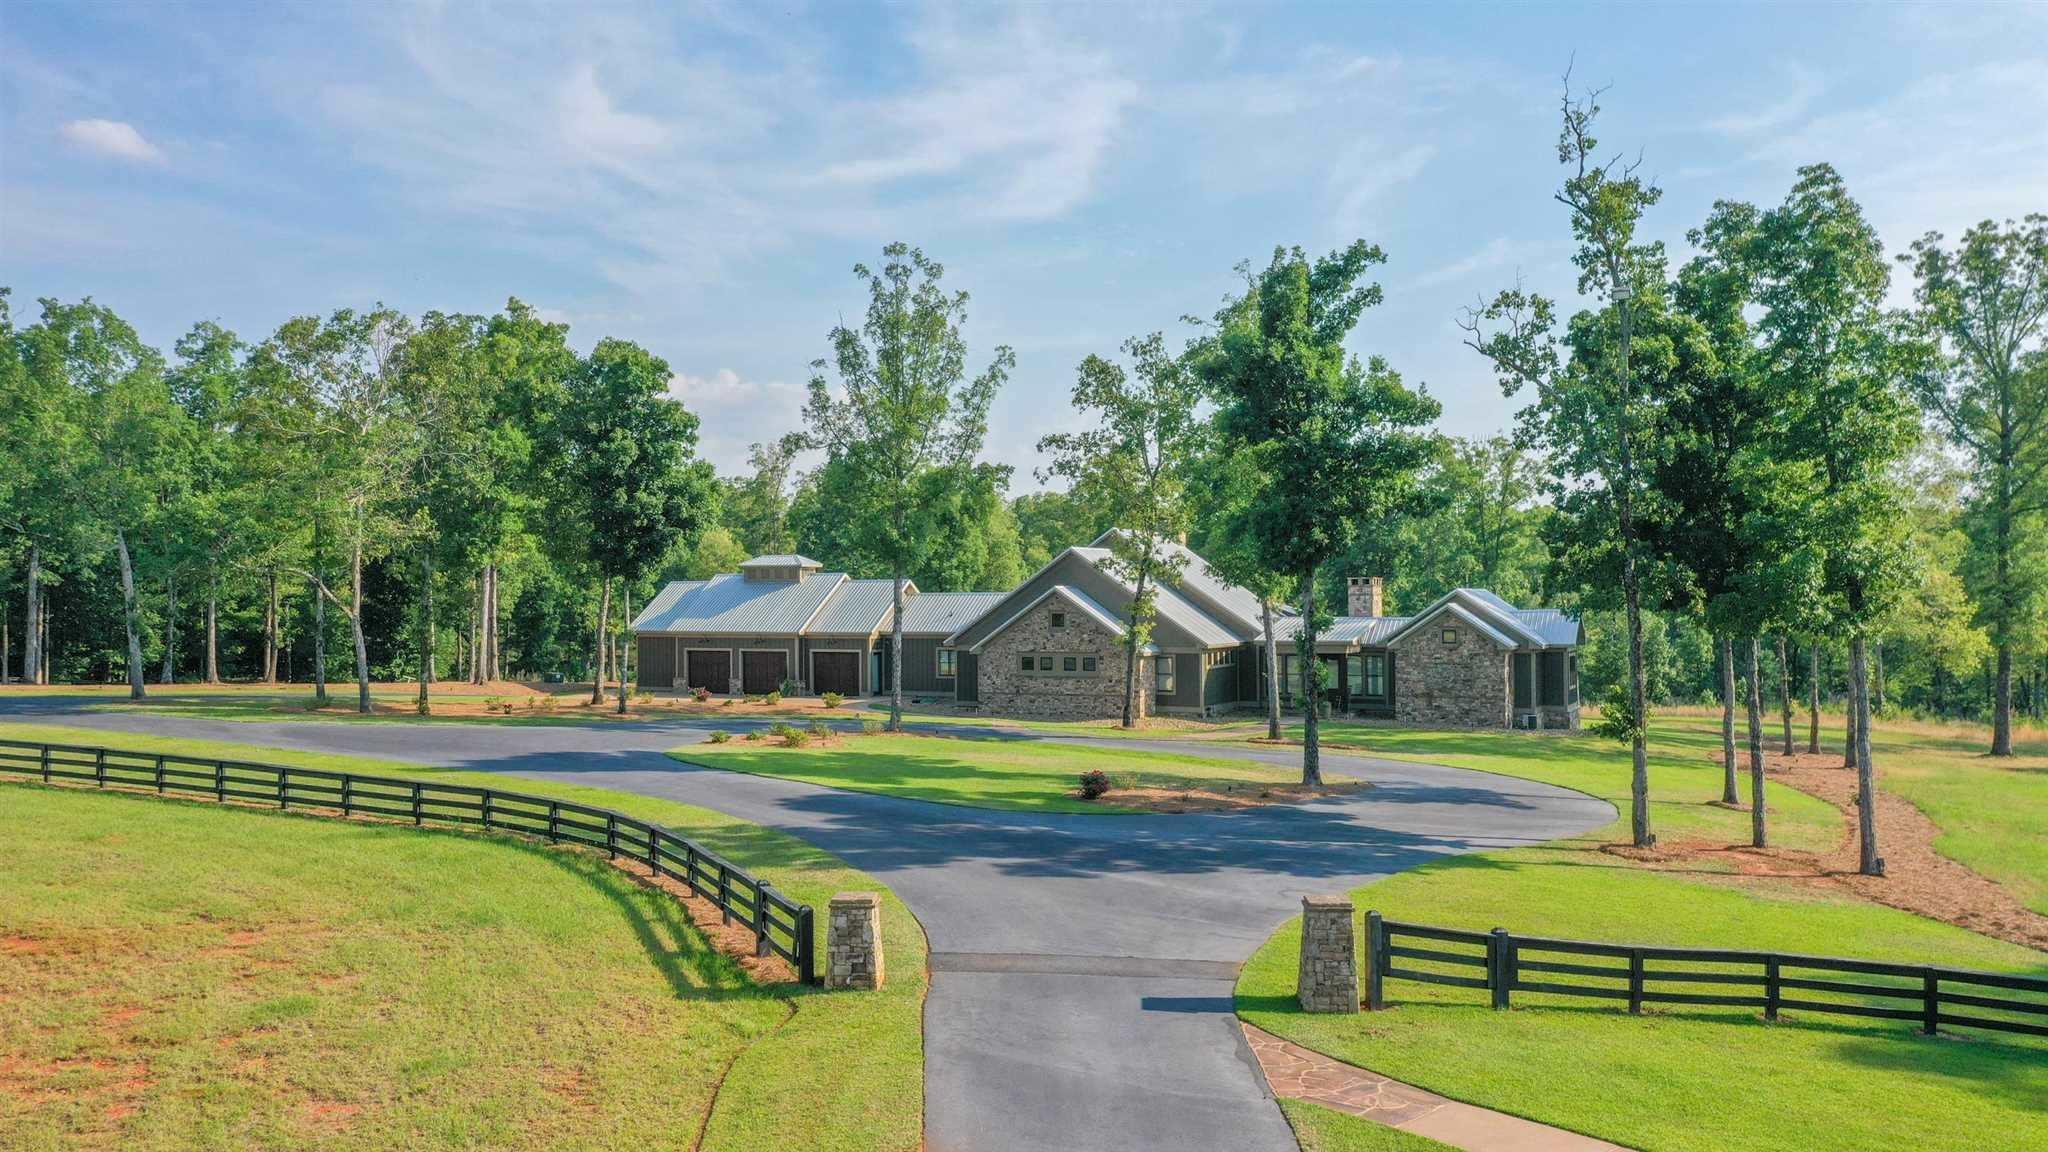 Property for sale at 190 HARMONY ROAD, Eatonton,  Georgia 31024